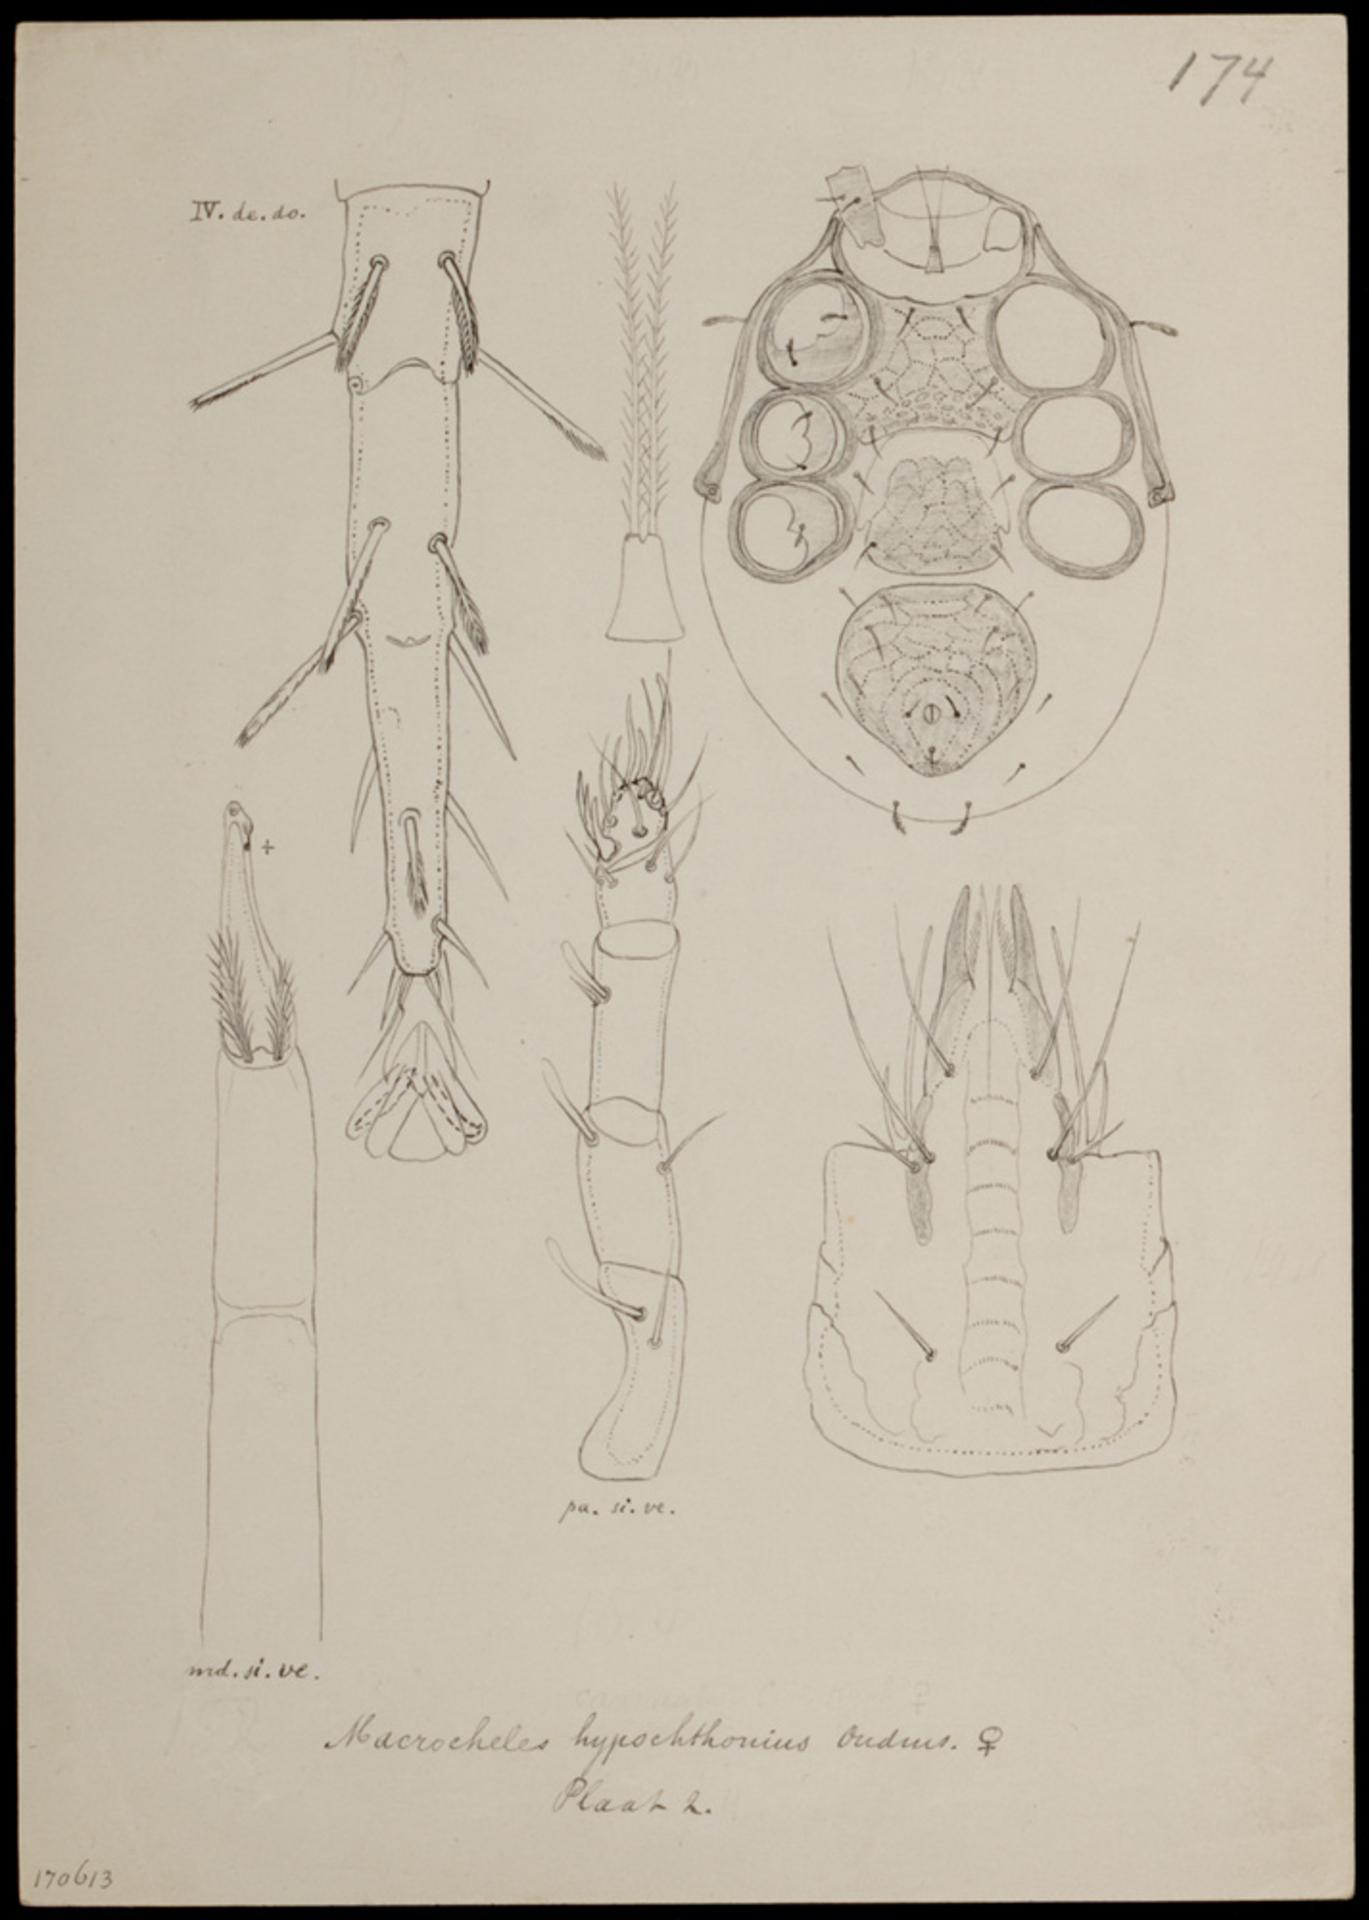 RMNH.ART.1034 | Macrocheles hypochthonius (Oudmans)